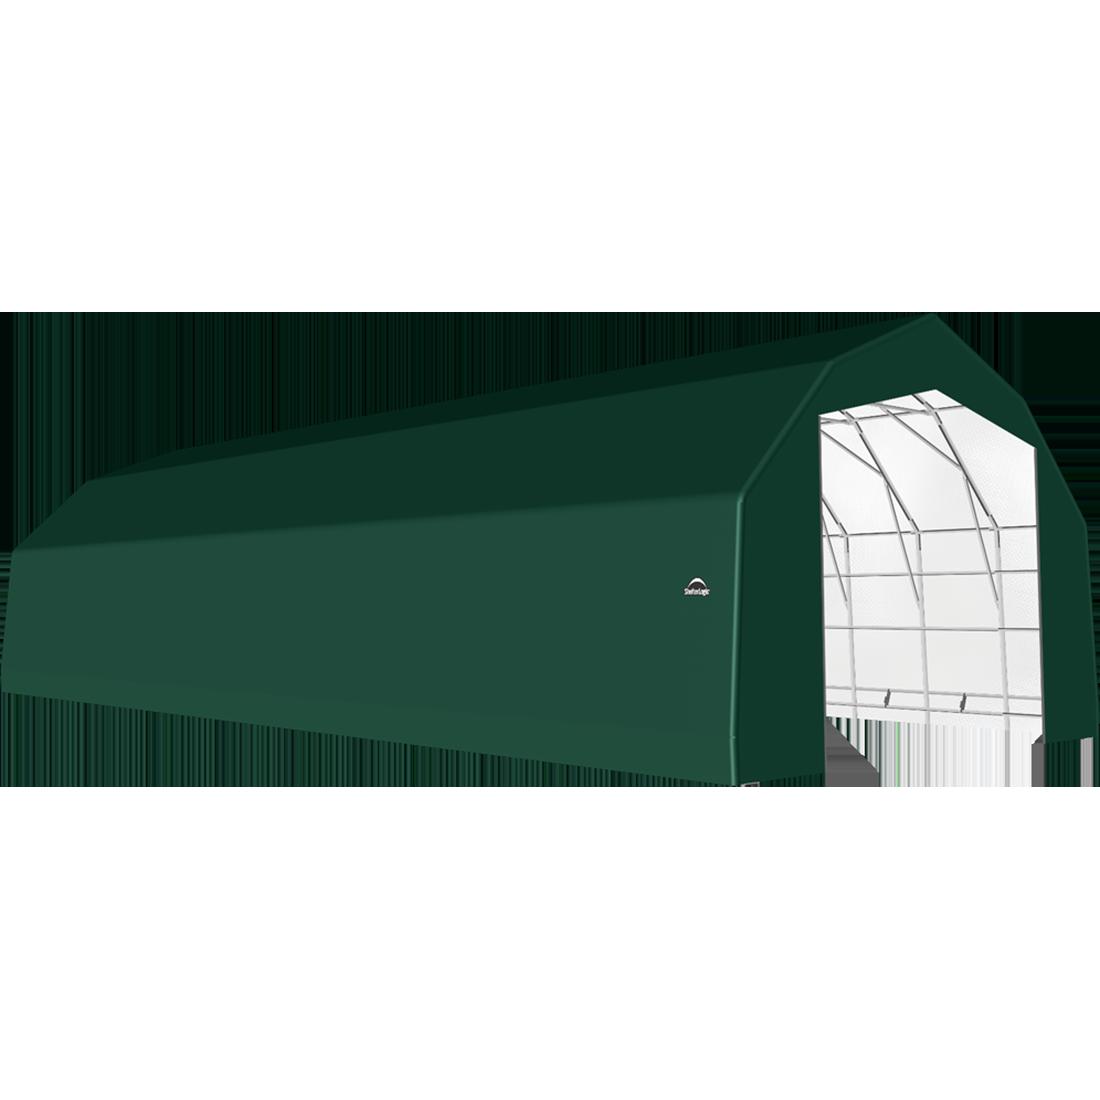 SP Barn 25X64X17 Green 14 oz PE Shelter